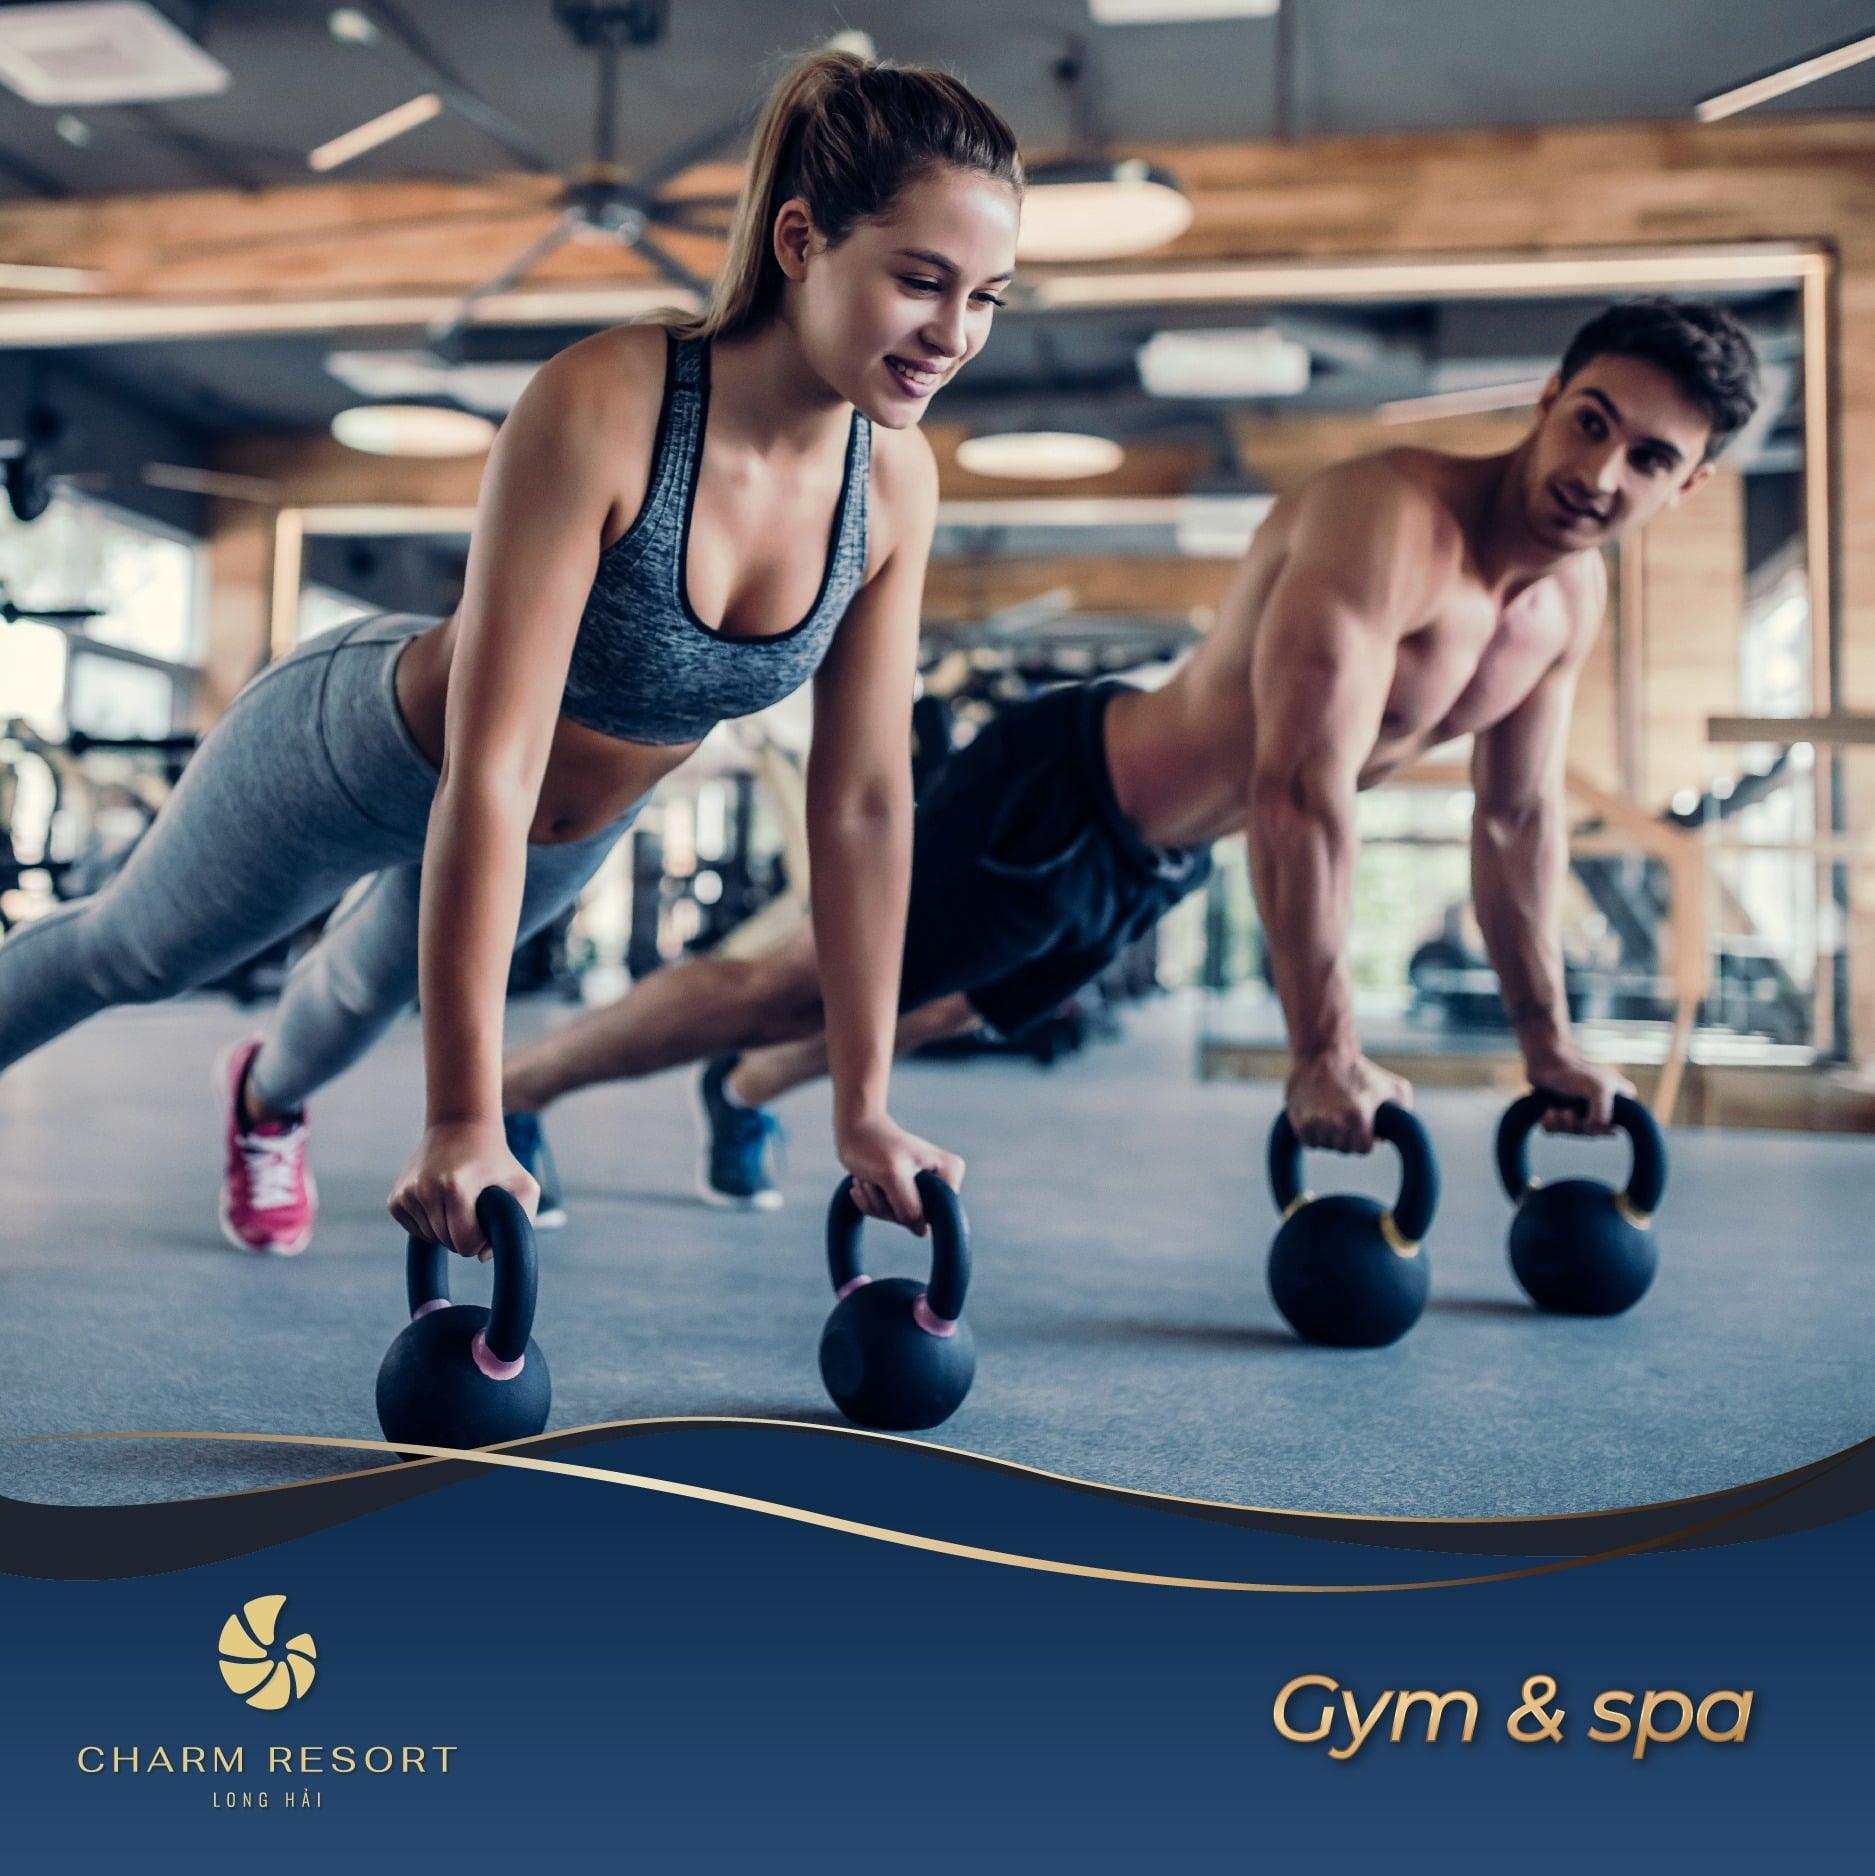 phong-tap-gym-spa-du-an-charm-resort